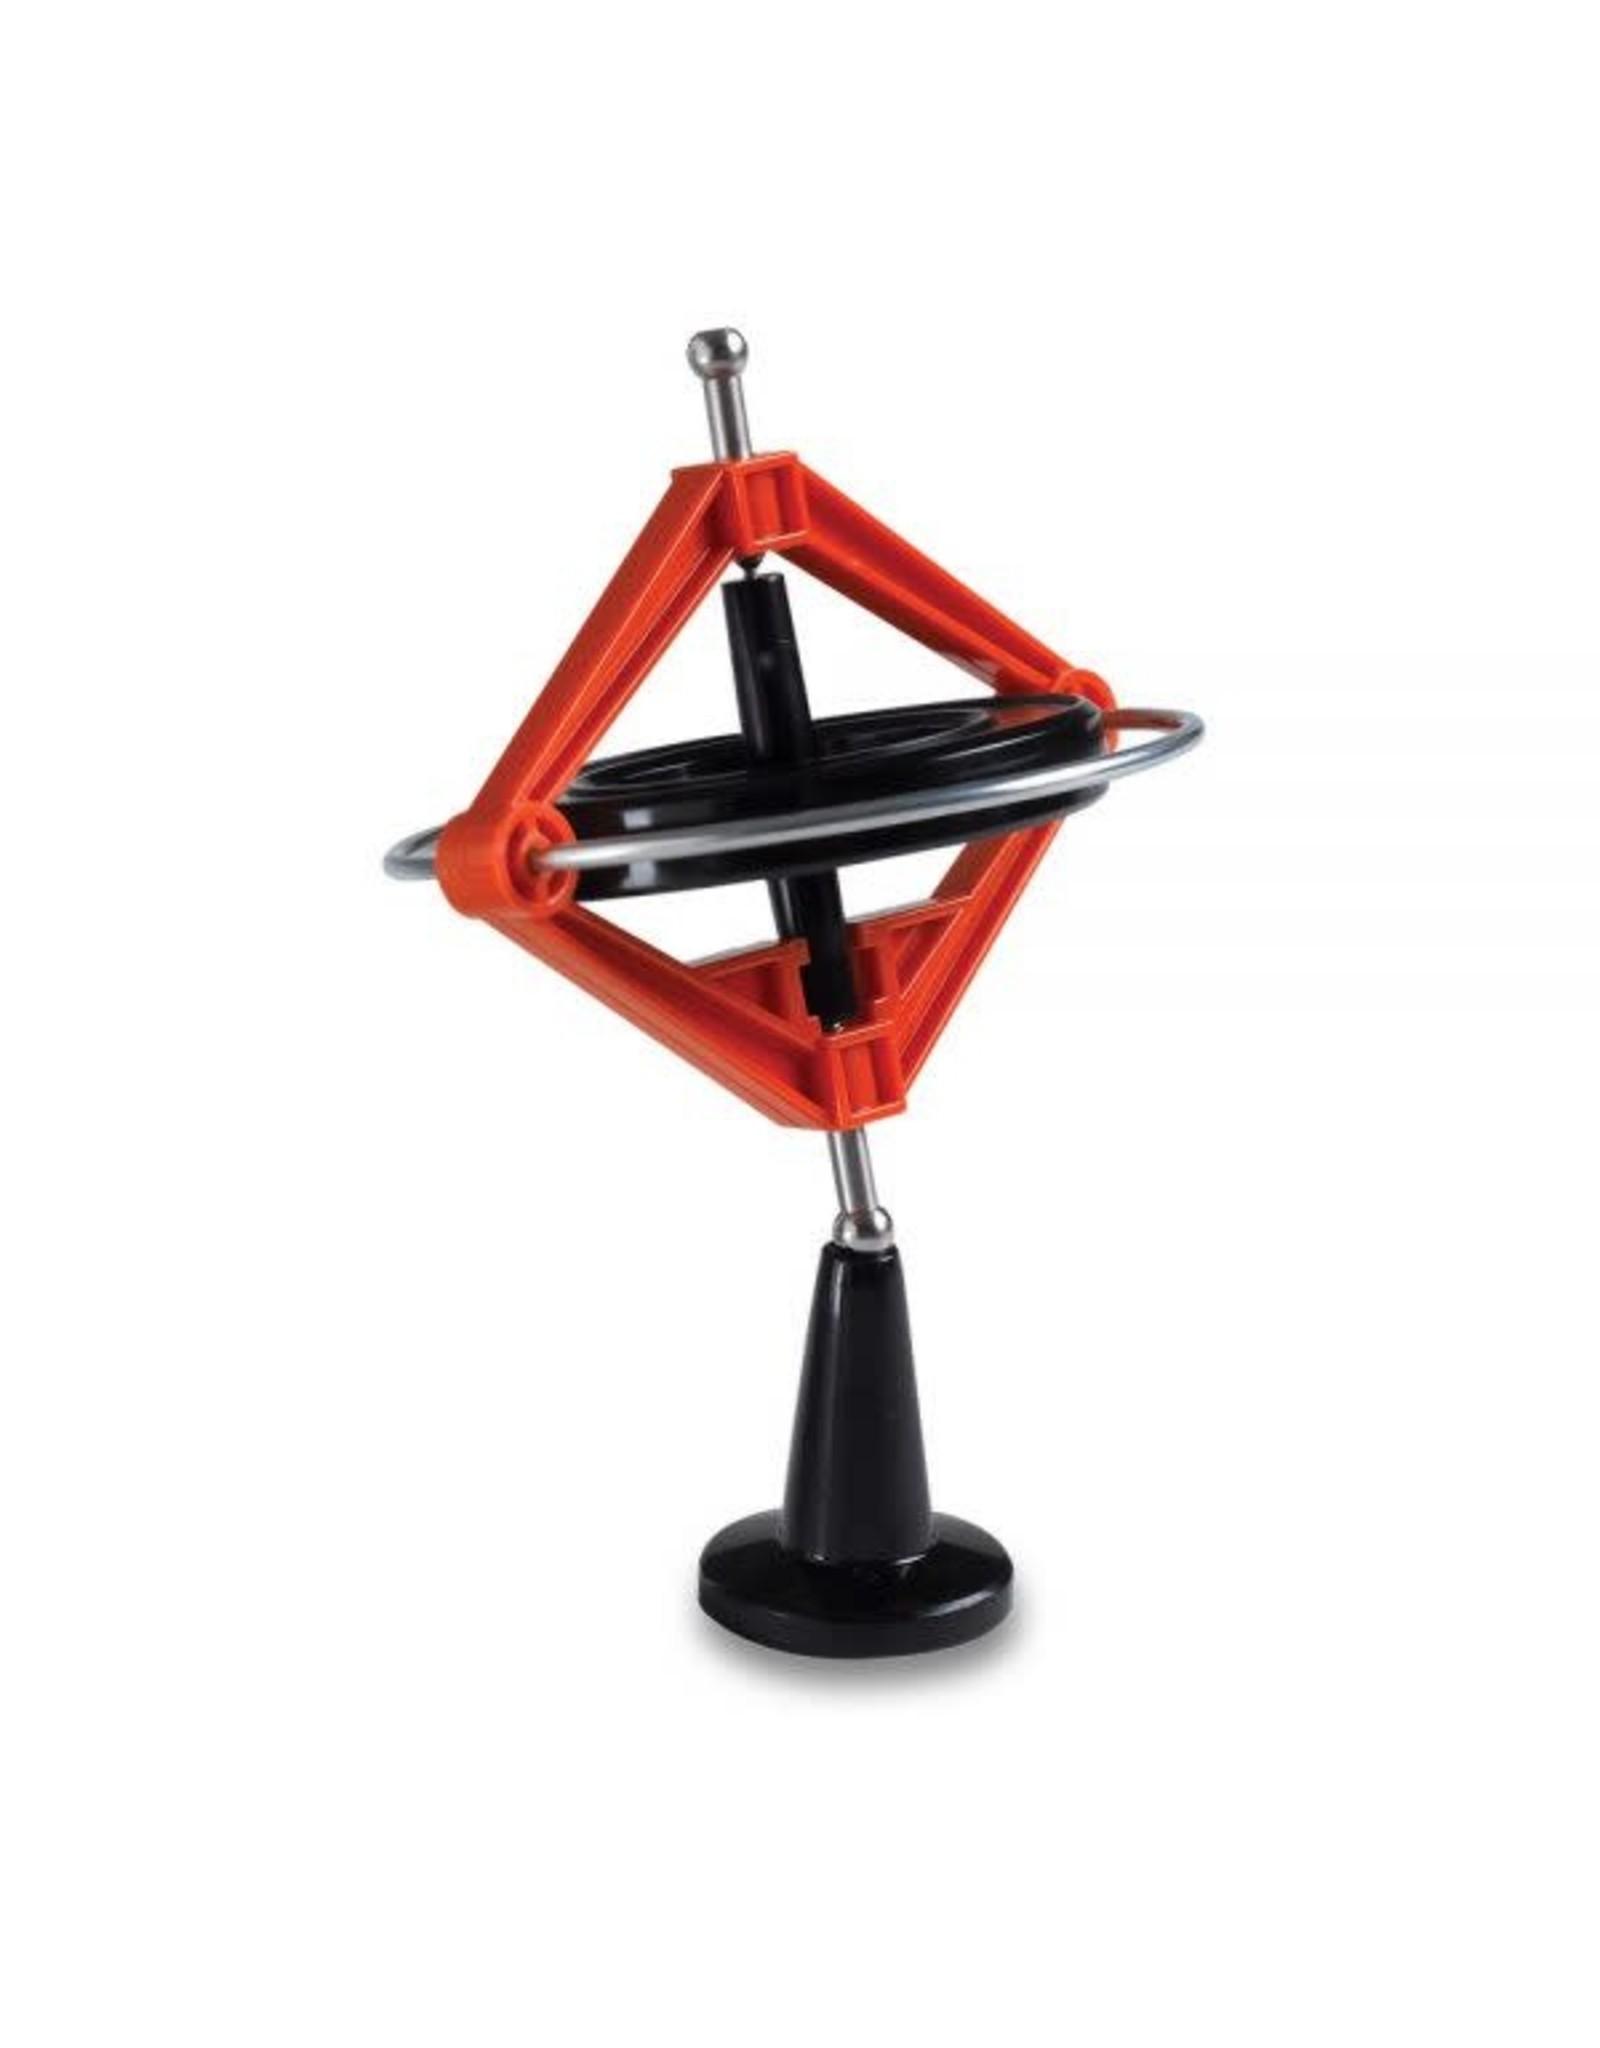 Tedco Precision Gyroscope